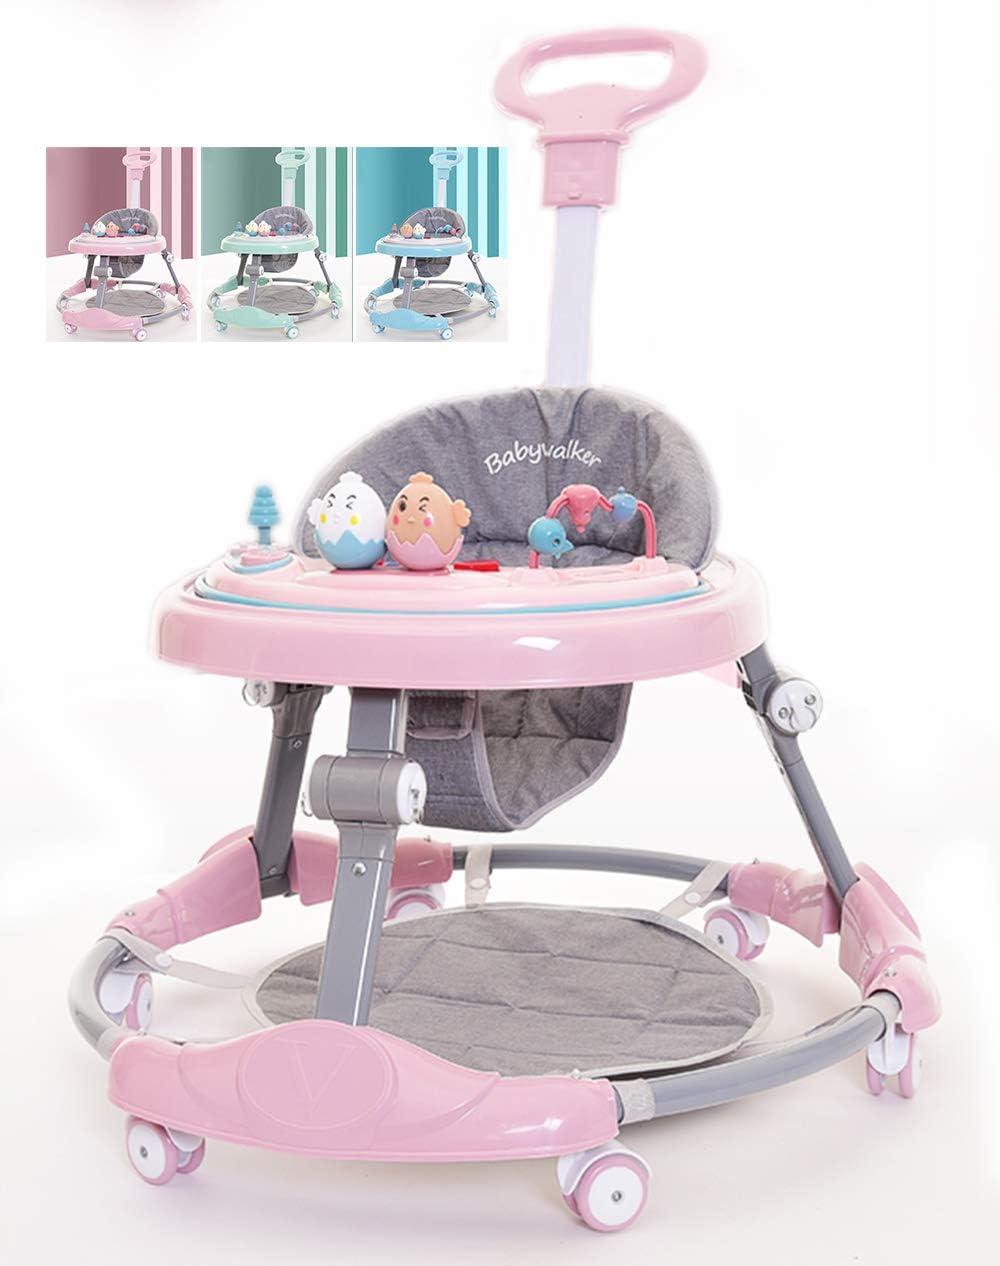 Olz Baby Walker 6-Speed Adjustment Multi-Function Anti-Rollover Anti-O-Legs Men and Women Toddler Walker Range 7-18 Months Boys and Girls